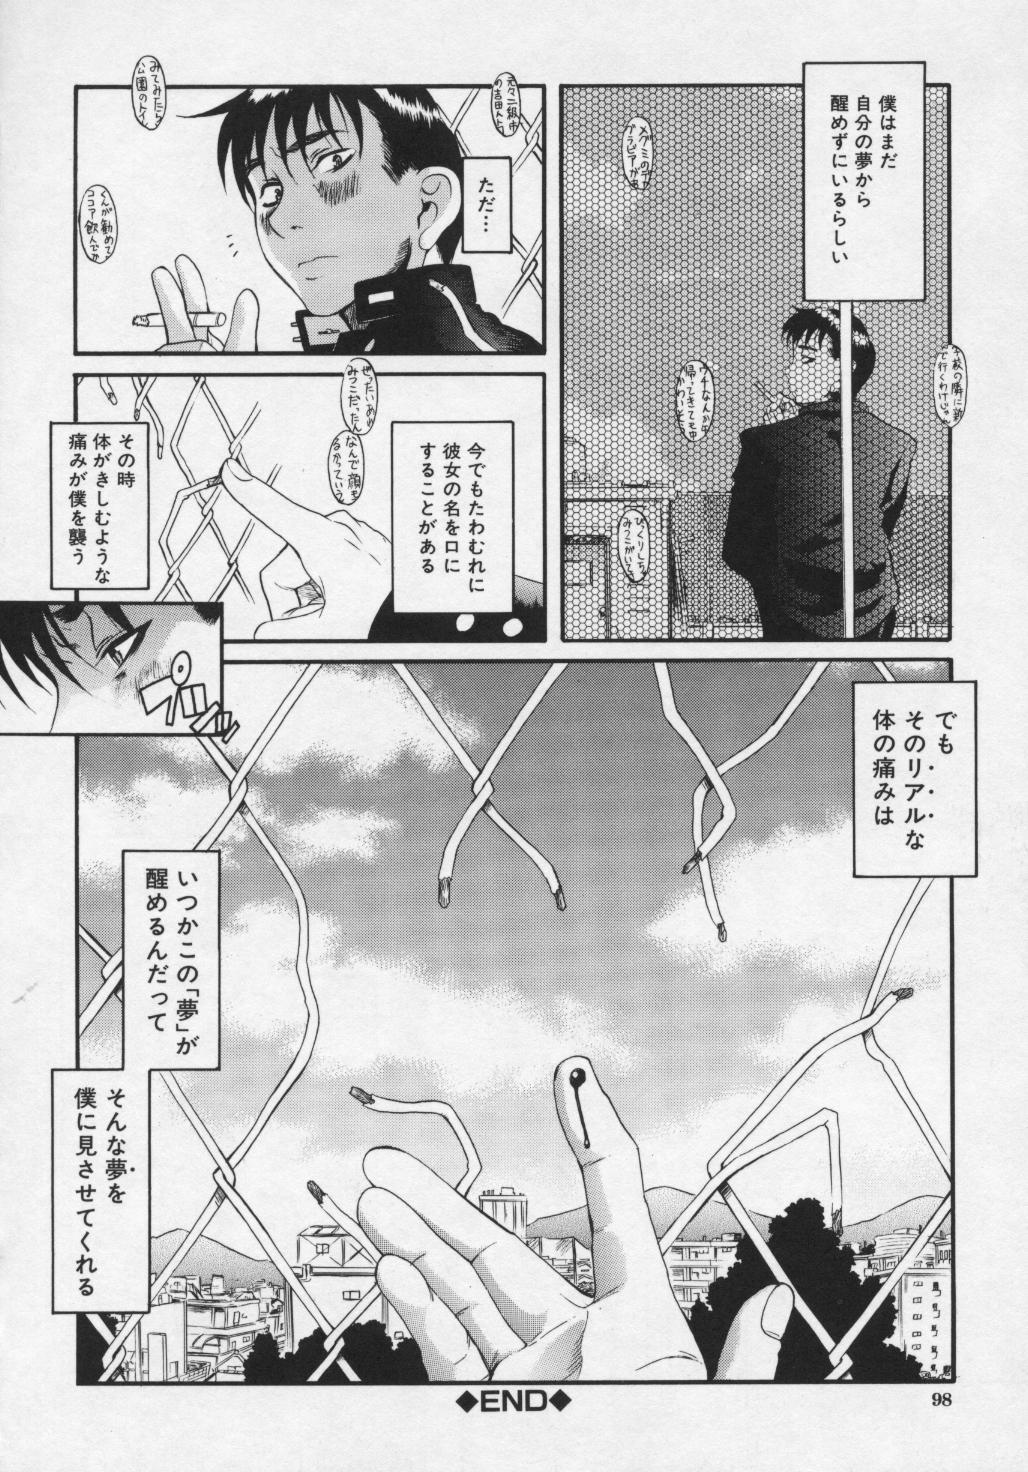 Kimi no Na o Yobeba - If I call your name. 98